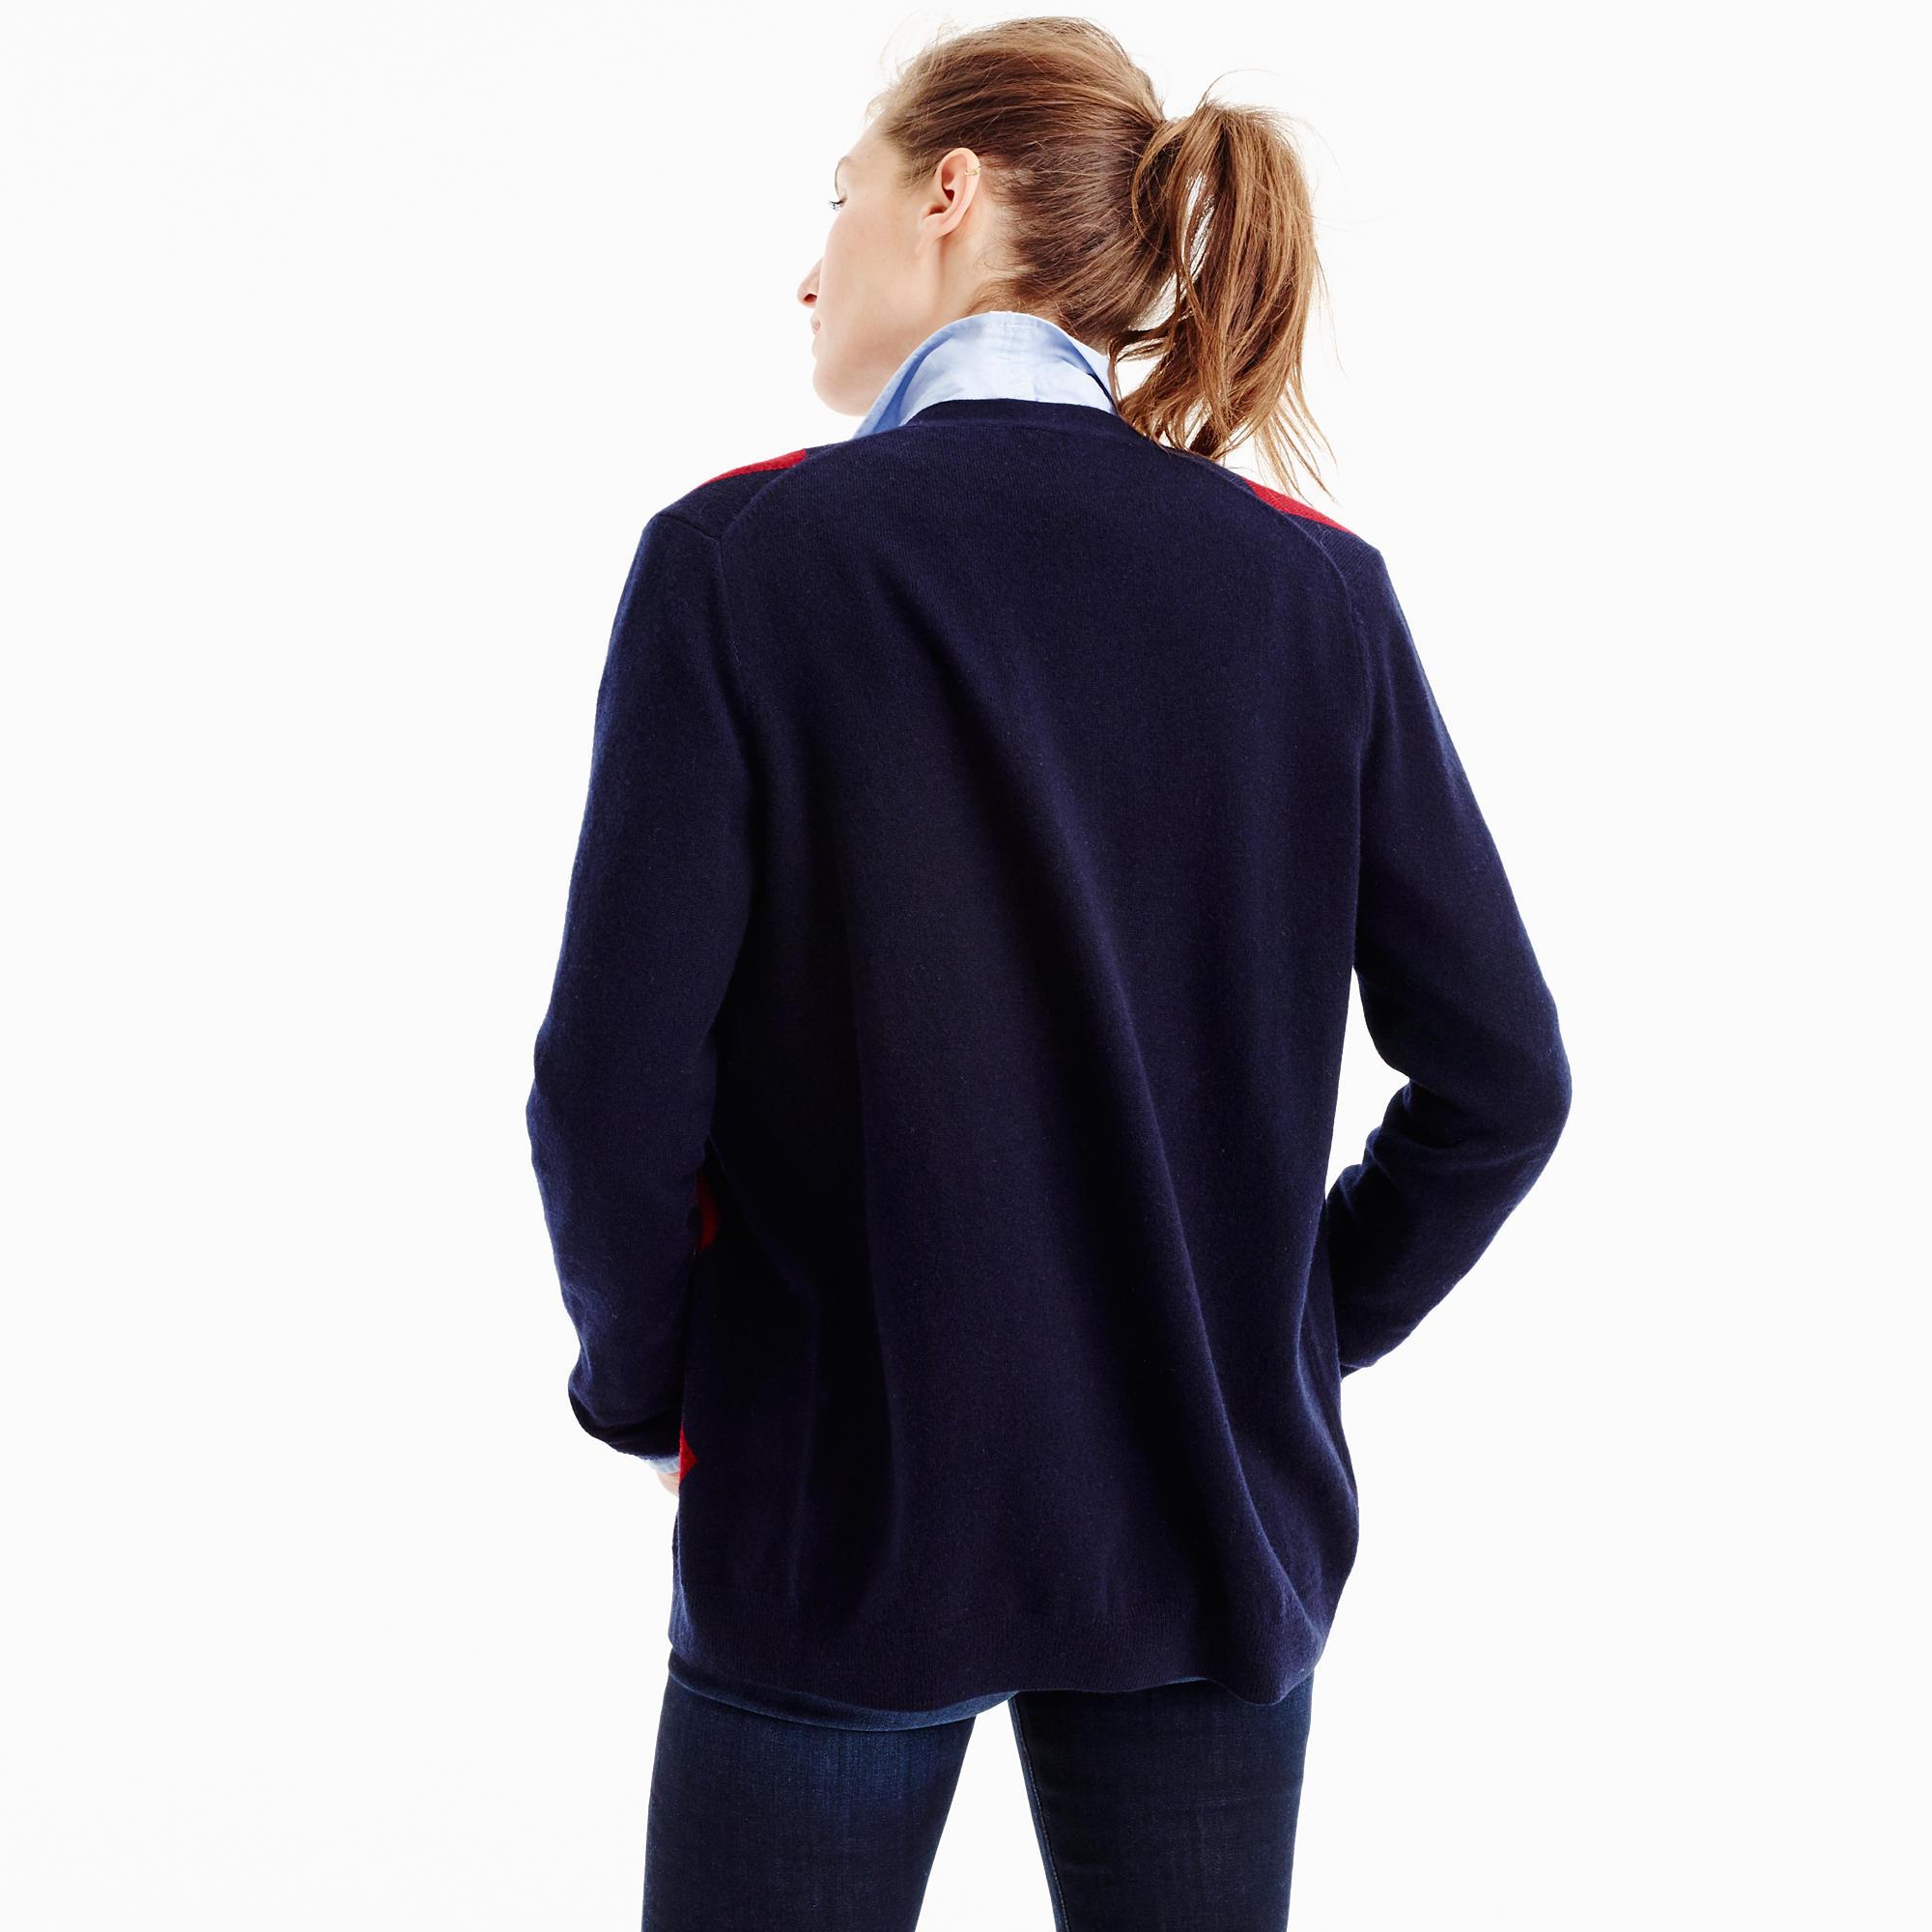 Italian Cashmere Boyfriend Cardigan Sweater In Argyle : Women's ...